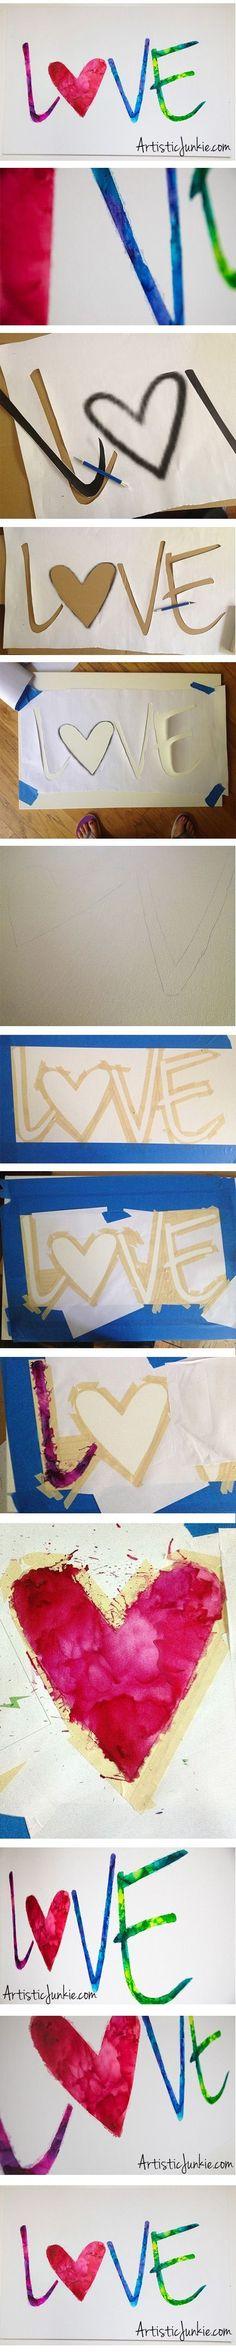 Love, Melted Crayon Art DIY tutorial by Jadon07